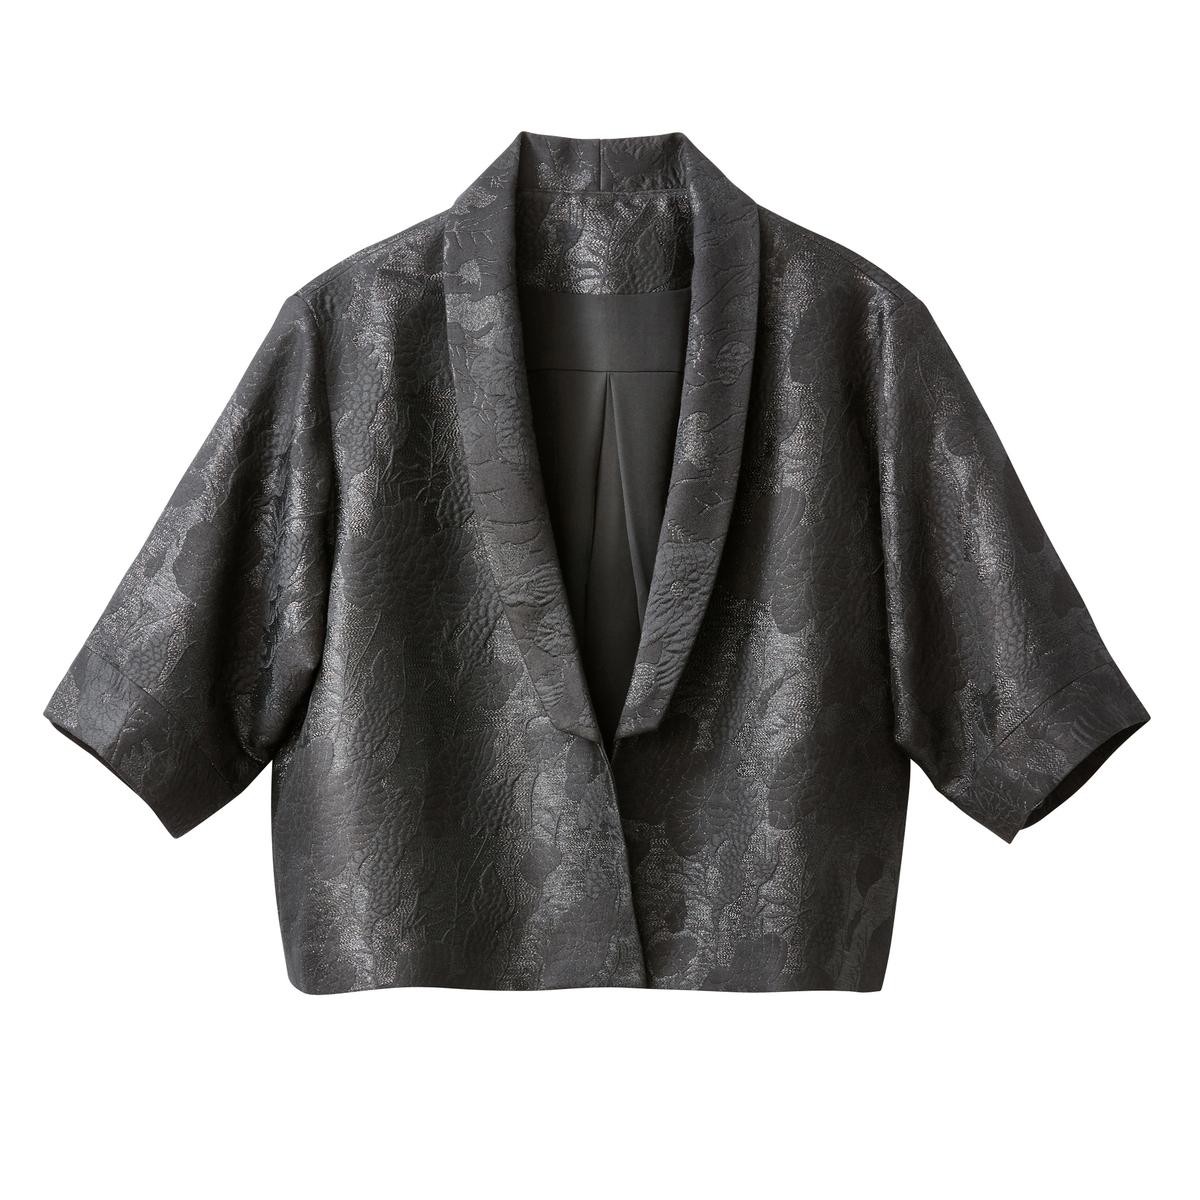 Chaqueta corta con forma kimono de jacquard